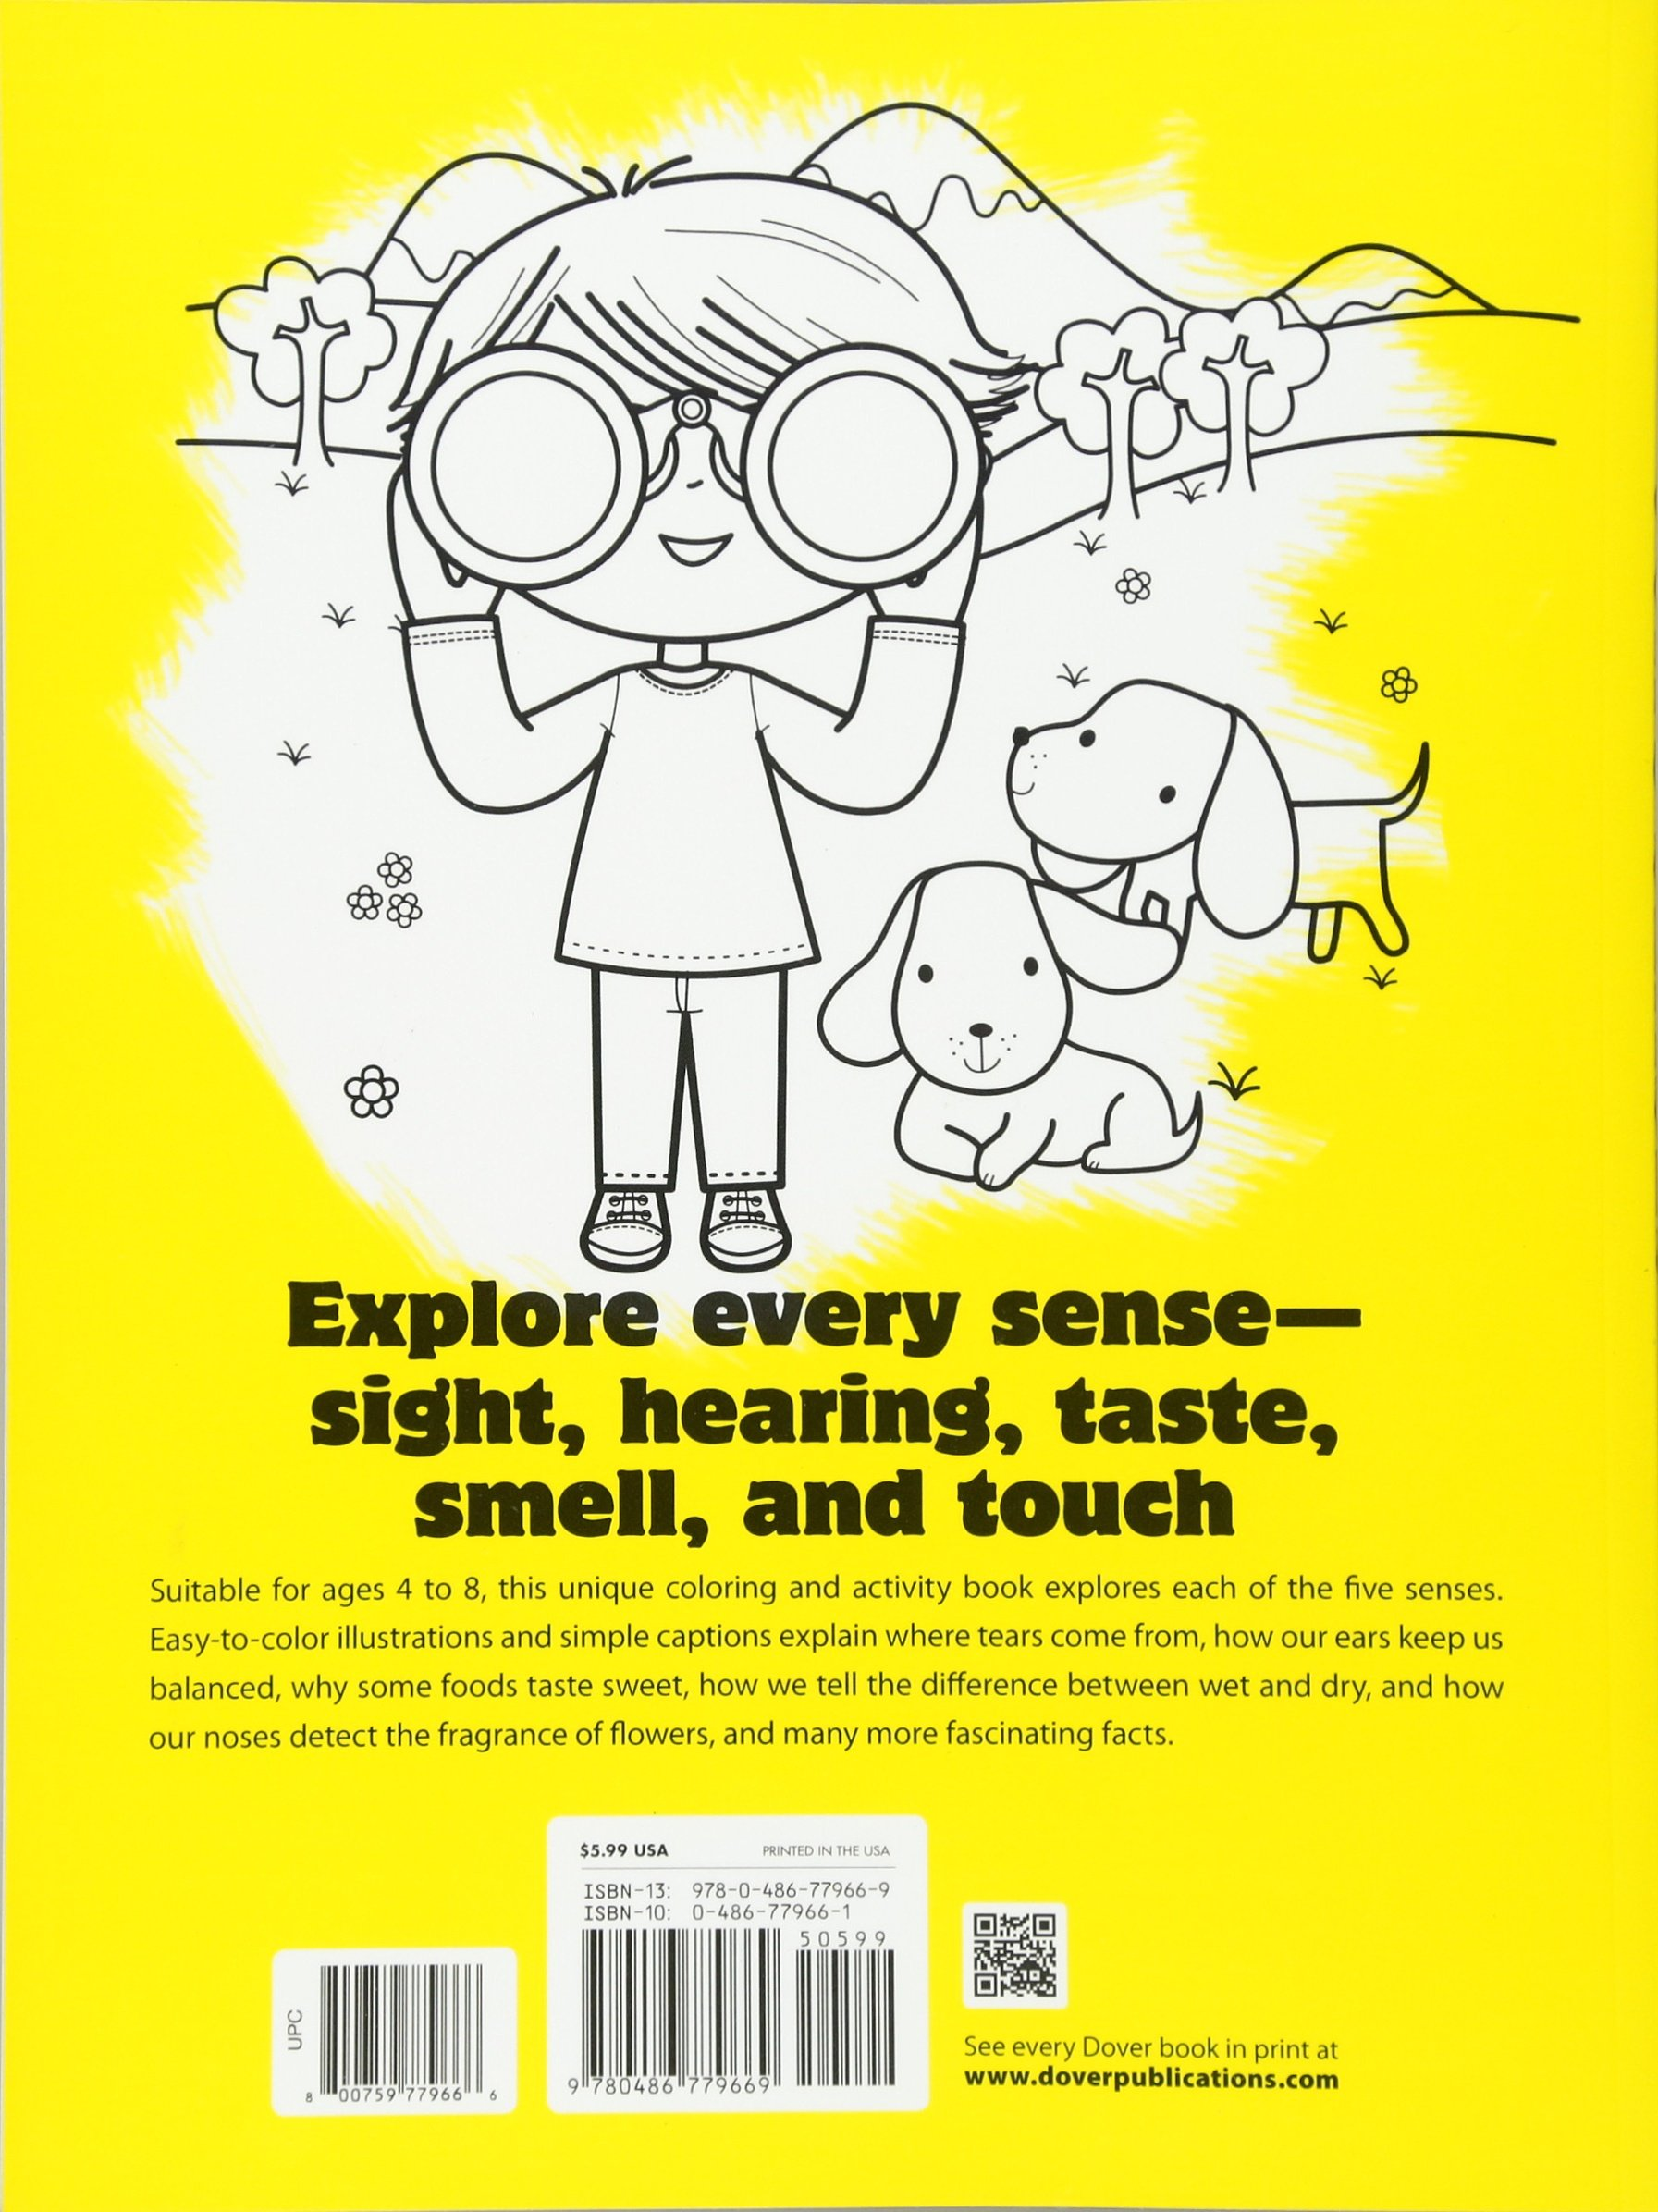 Our 5 Senses Coloring Book (dover Coloring Books For Children): Jillian  Phillips, John Kurtz: 9780486779669: Amazon: Books